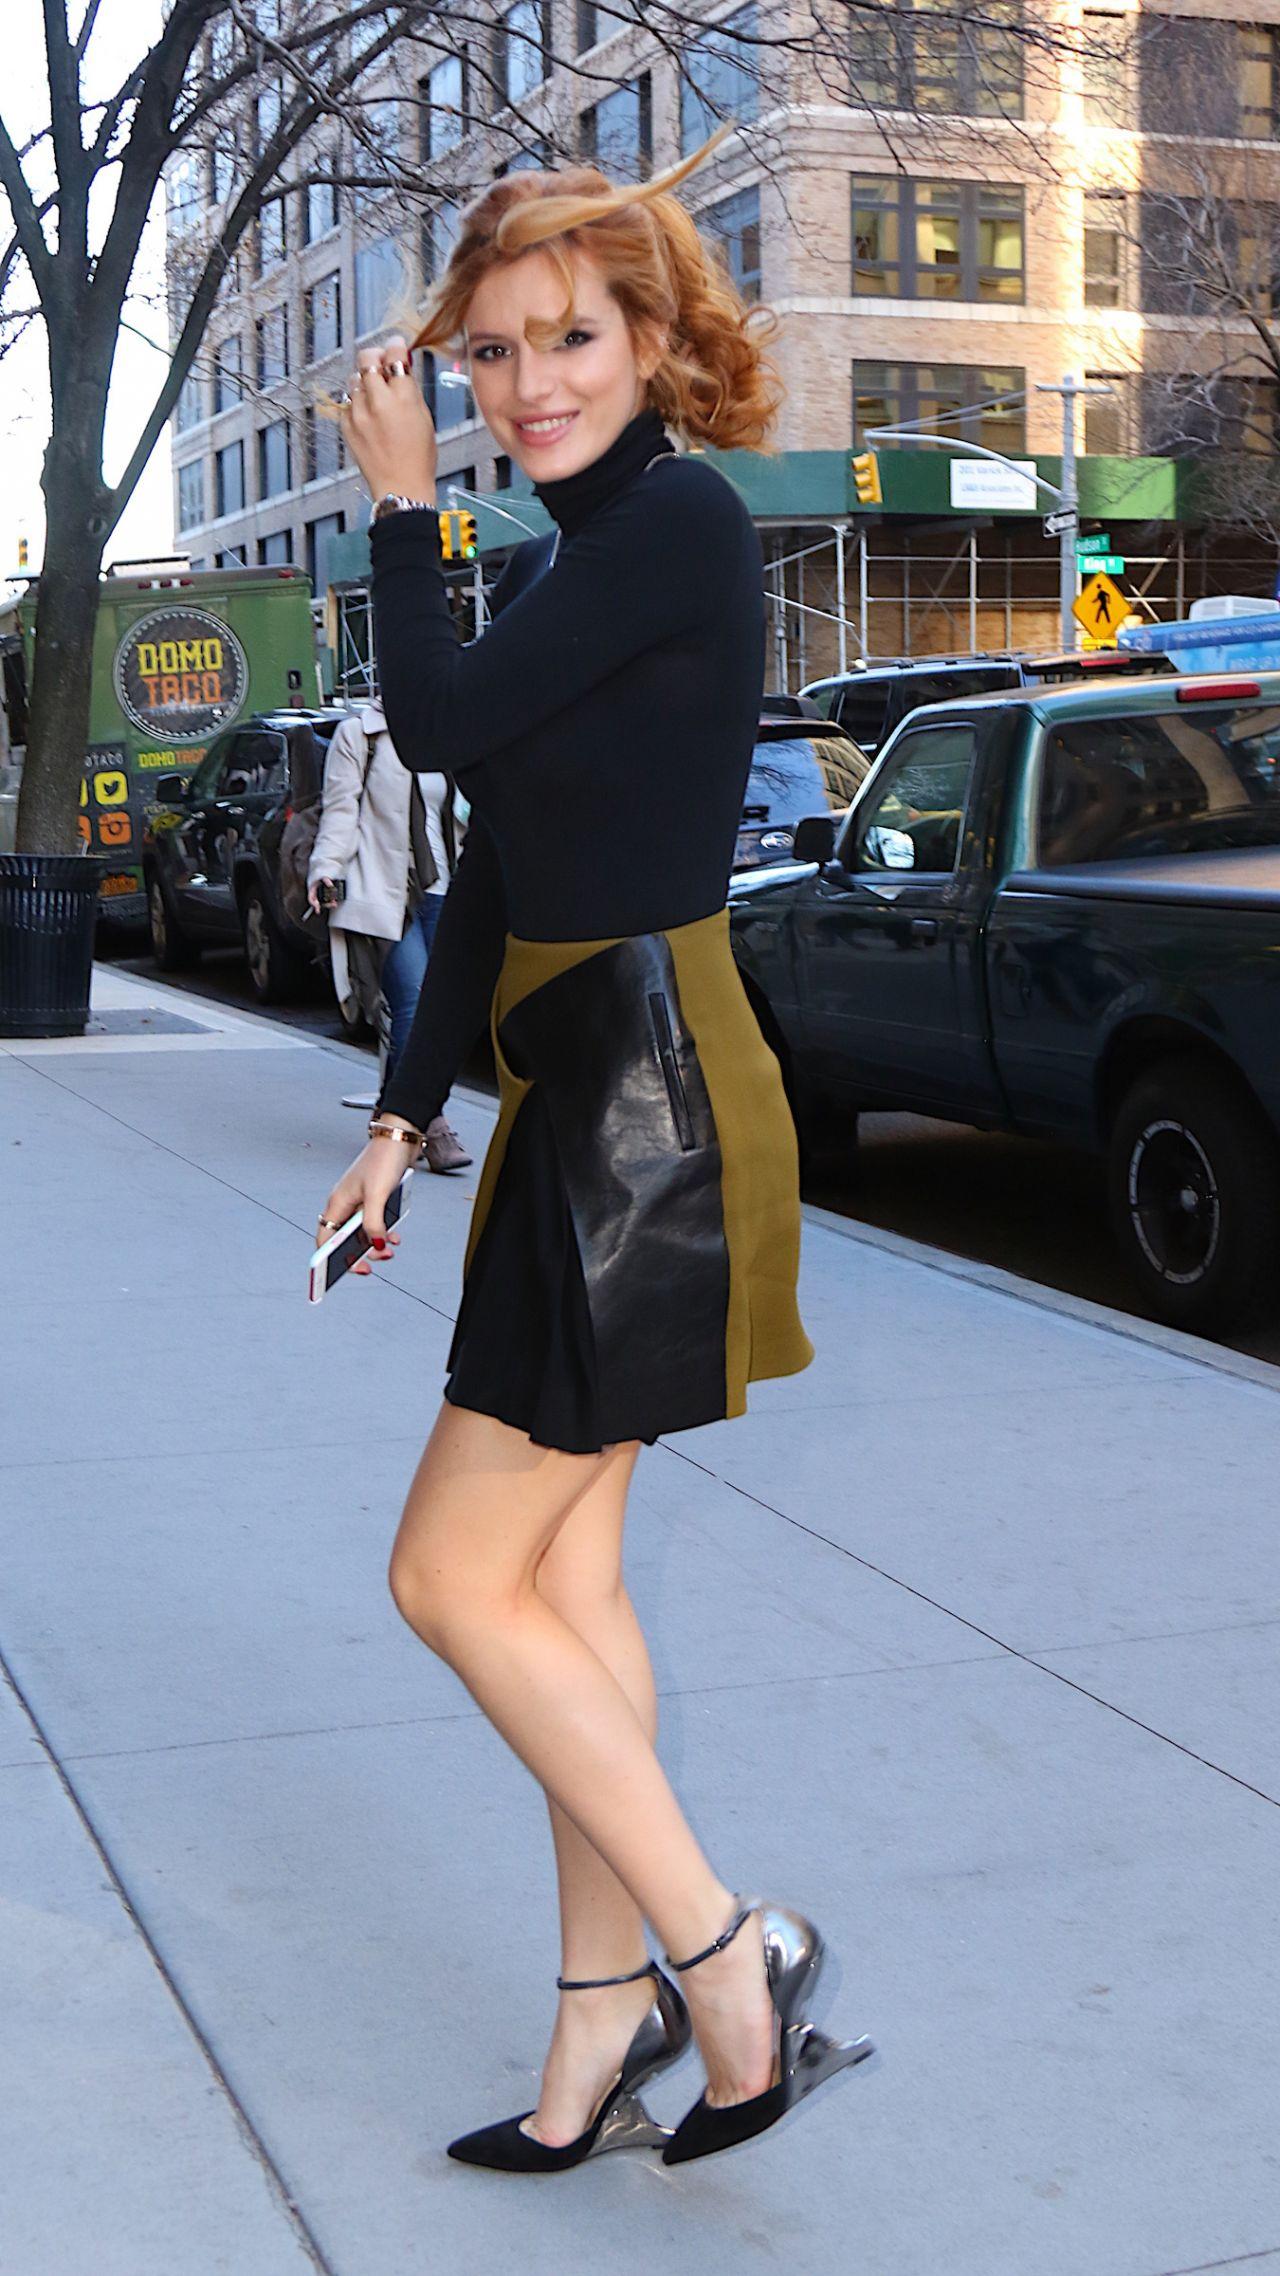 Bella Thorne Leggy in Mini Skirt  Out in New York City